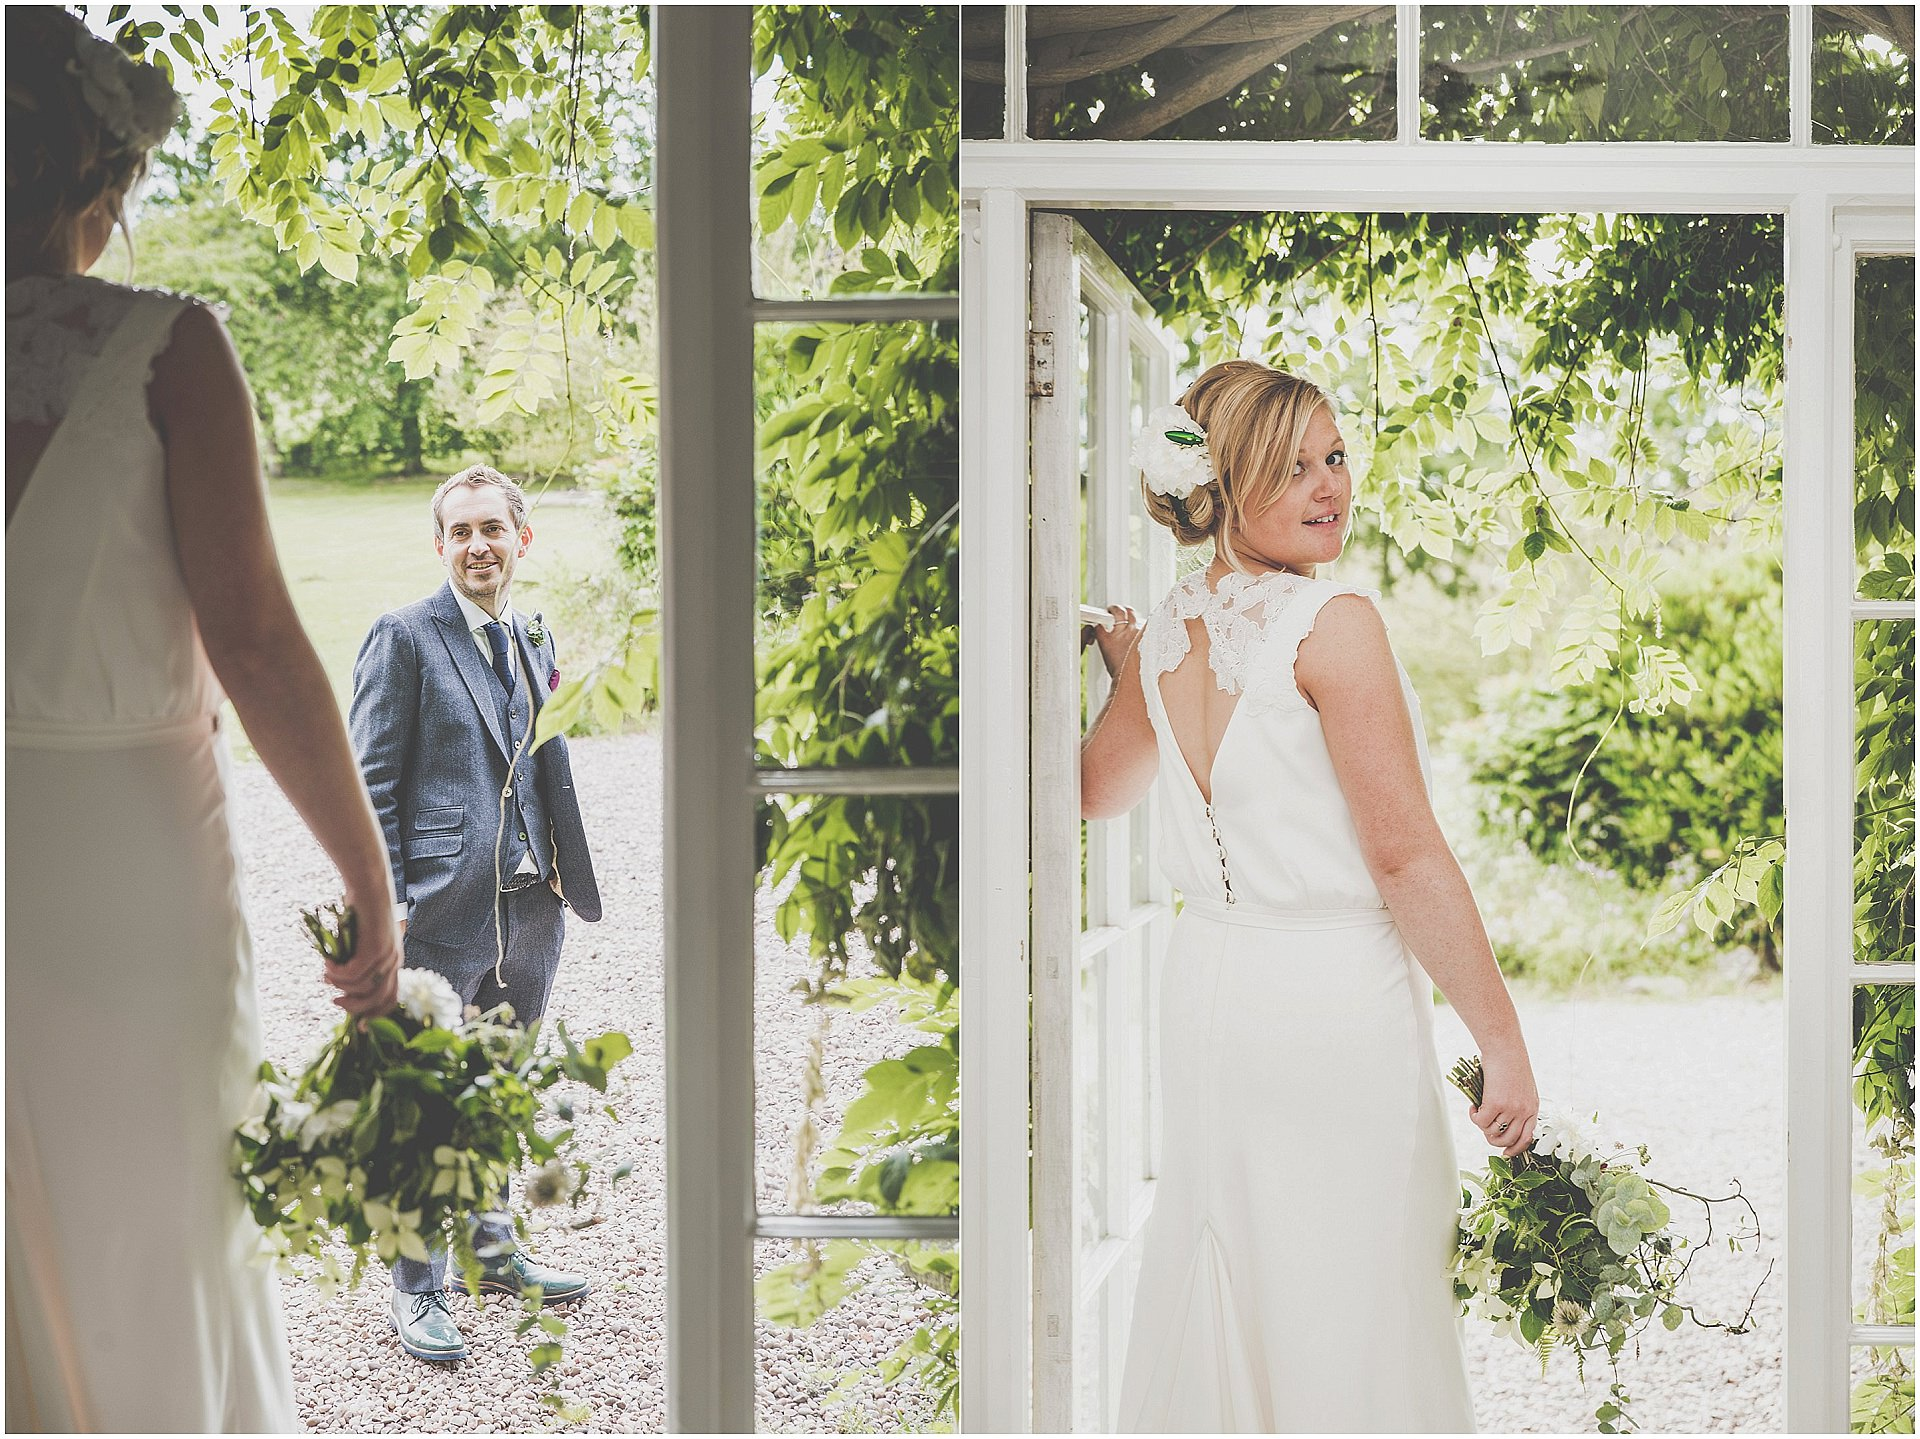 Lyde Court weddings